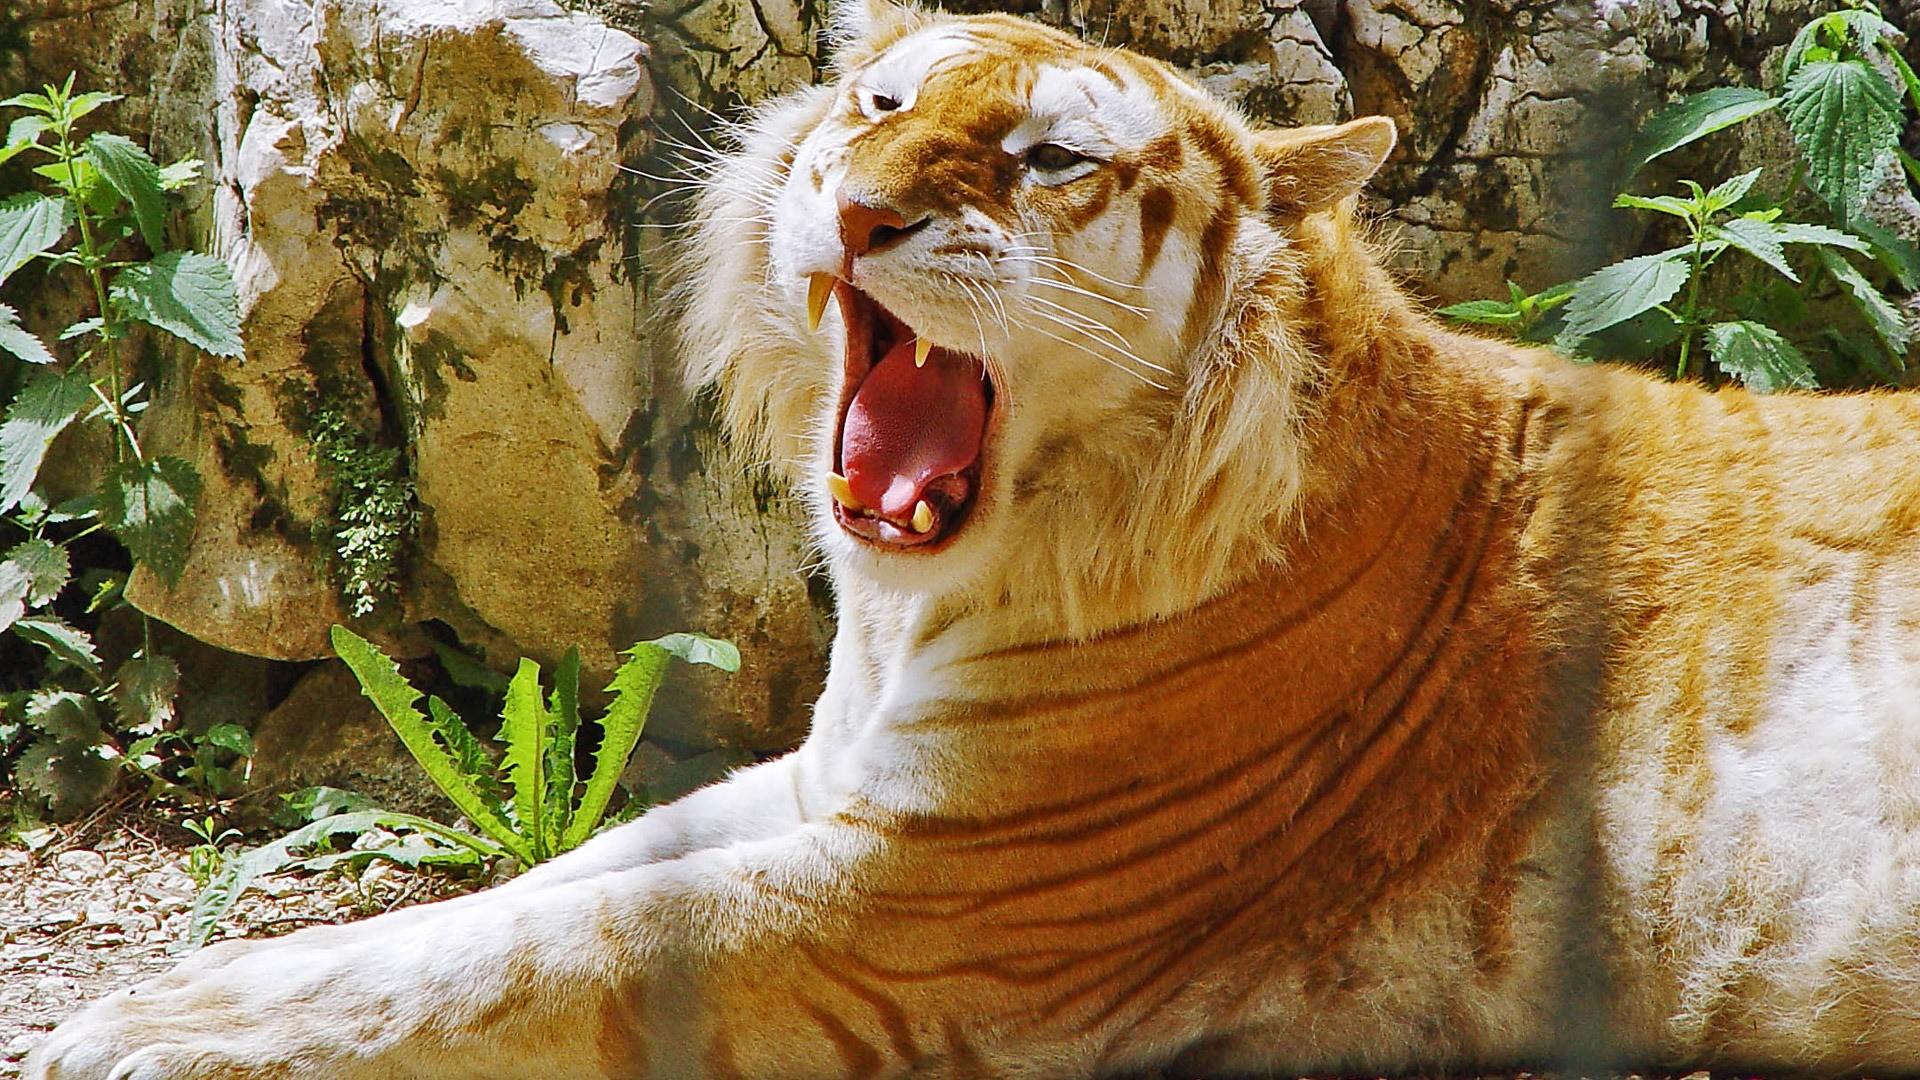 Res: 1920x1080, Golden Tiger Wallpaper Tigers Animals Wallpapers